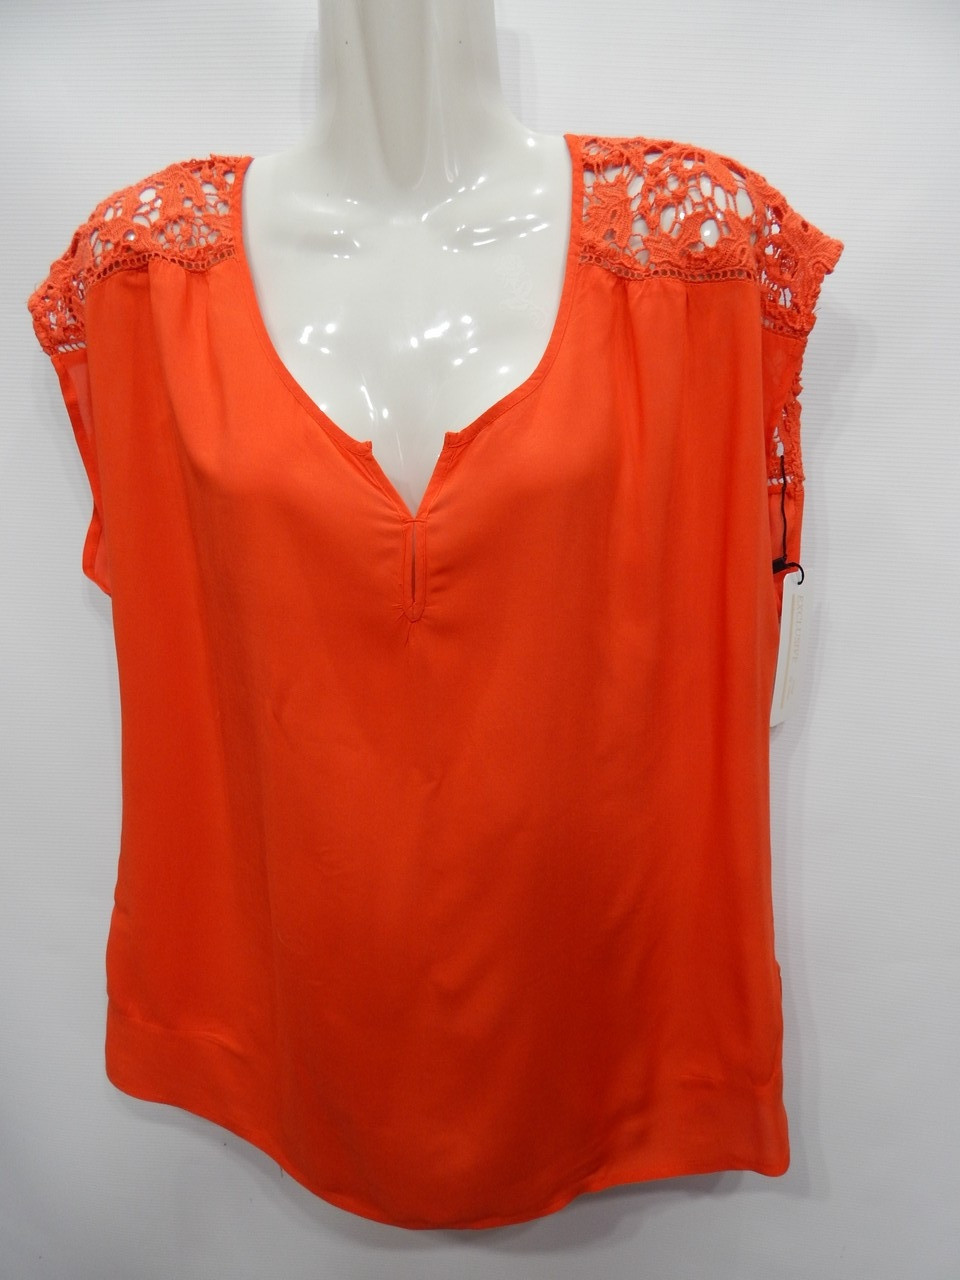 Блуза легкая фирменная женская  50-52 р., 195бж